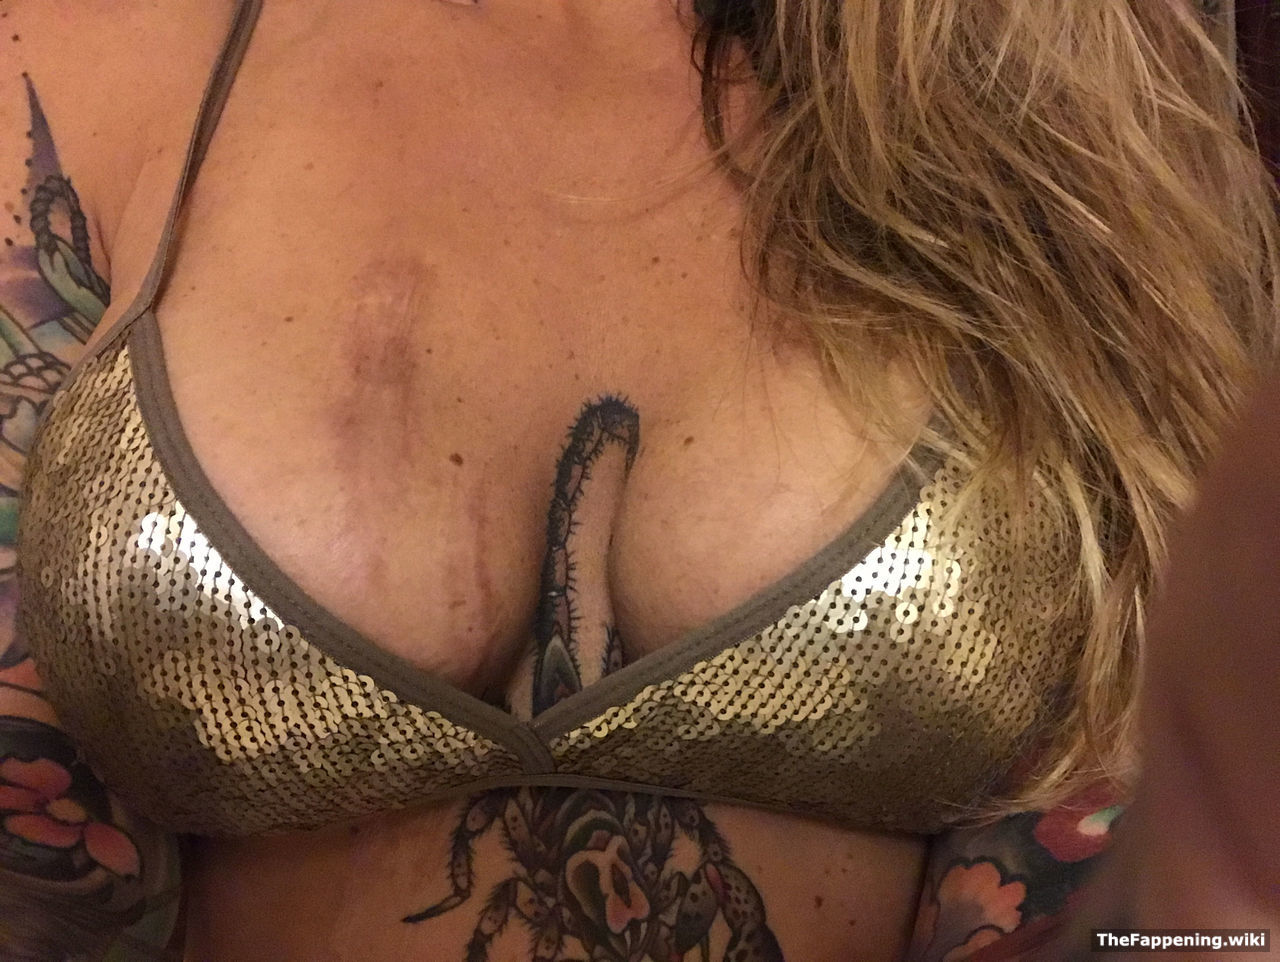 Famous nicki minaj nip slip went viral Hot pic Candice swanepoel lingerie pics,Adrianne Curry Selfies